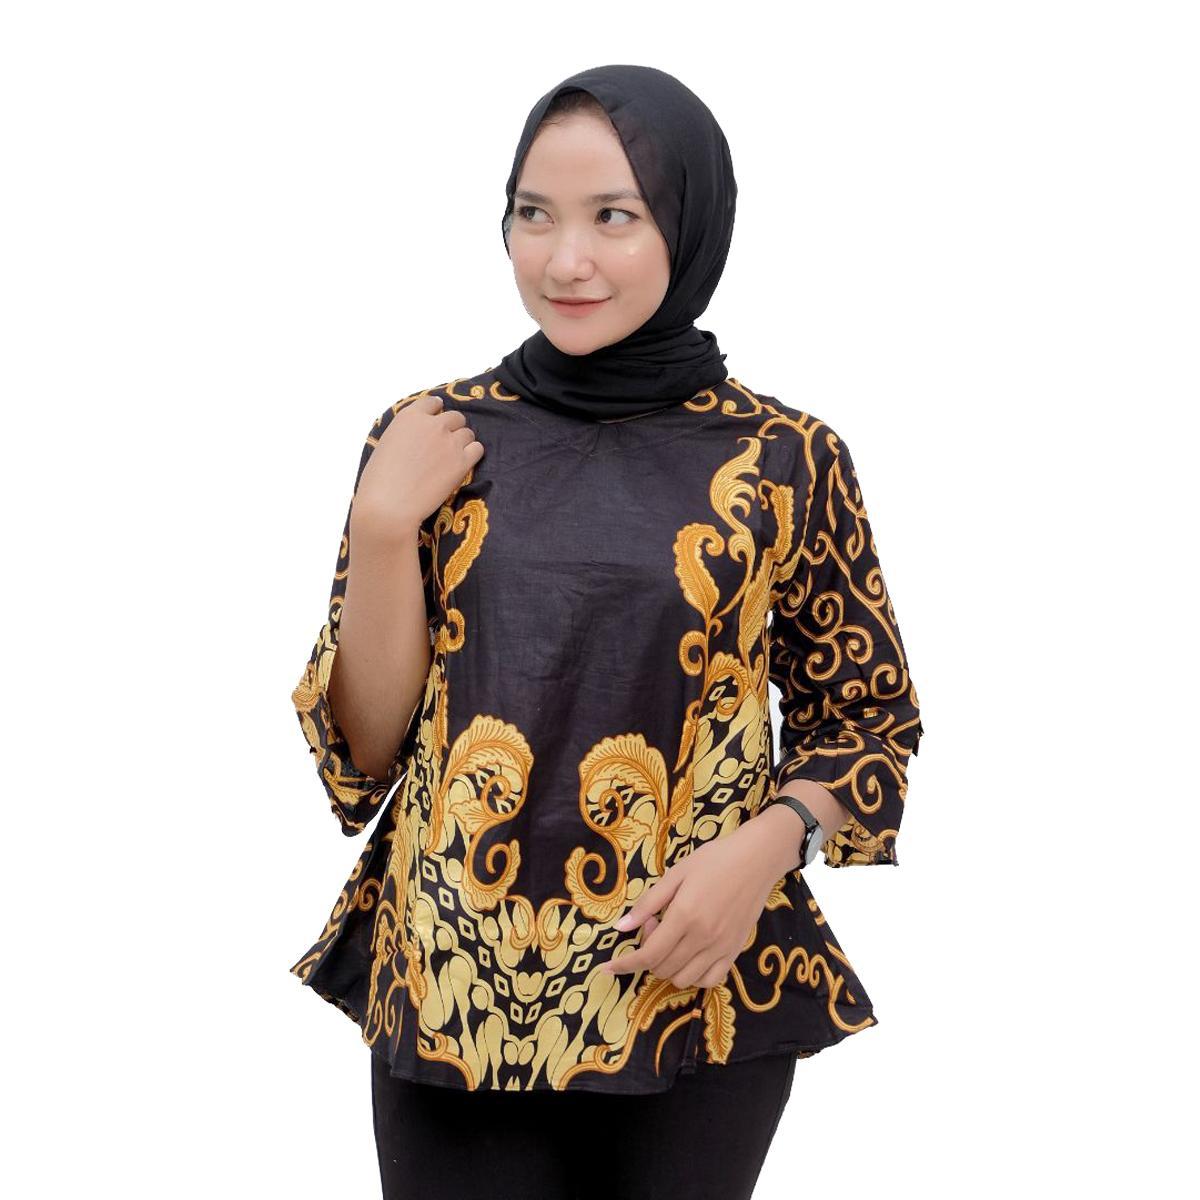 Baju Atasan Wanita Blouse Batik Modern Baju Kerja